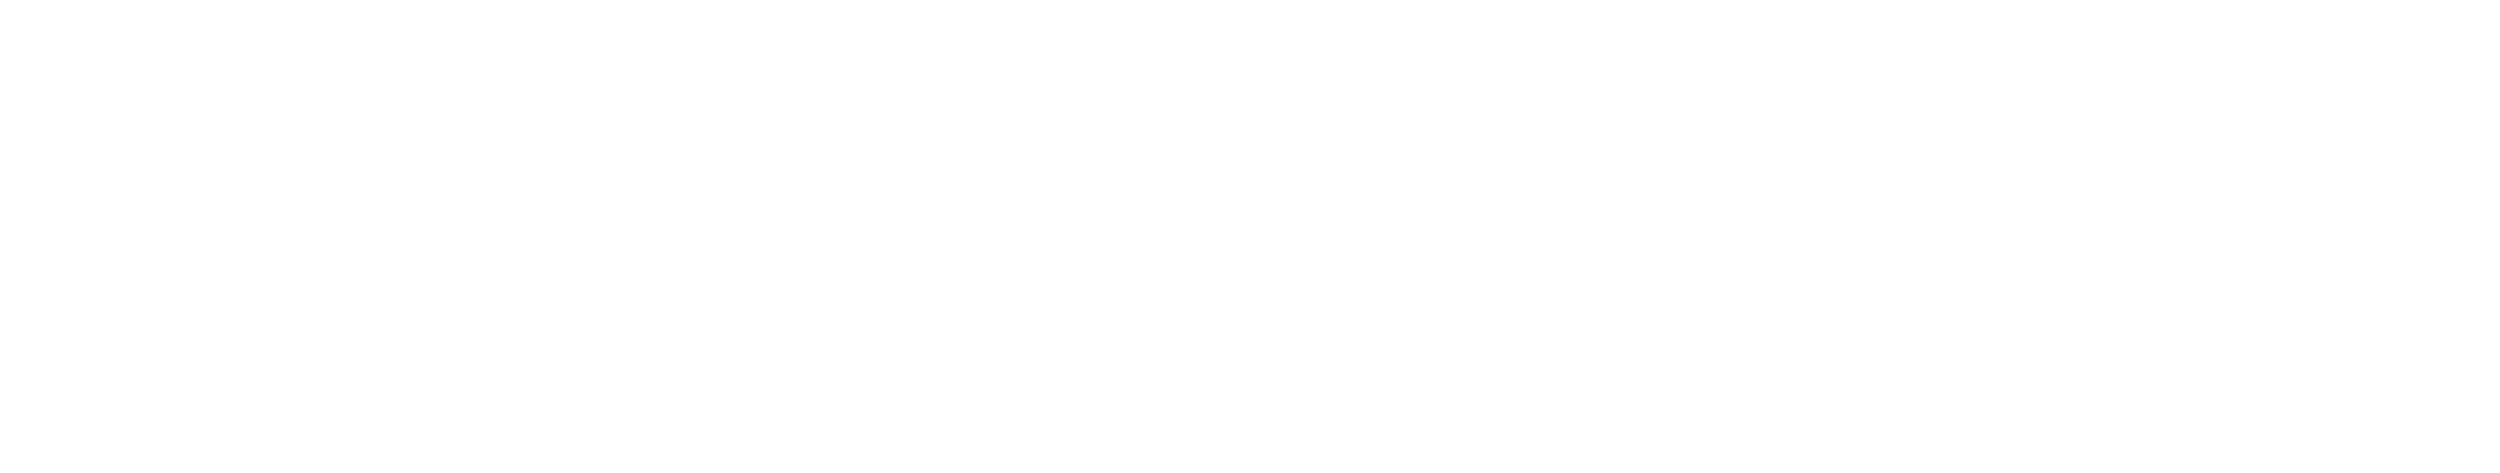 logo_makediscples.png